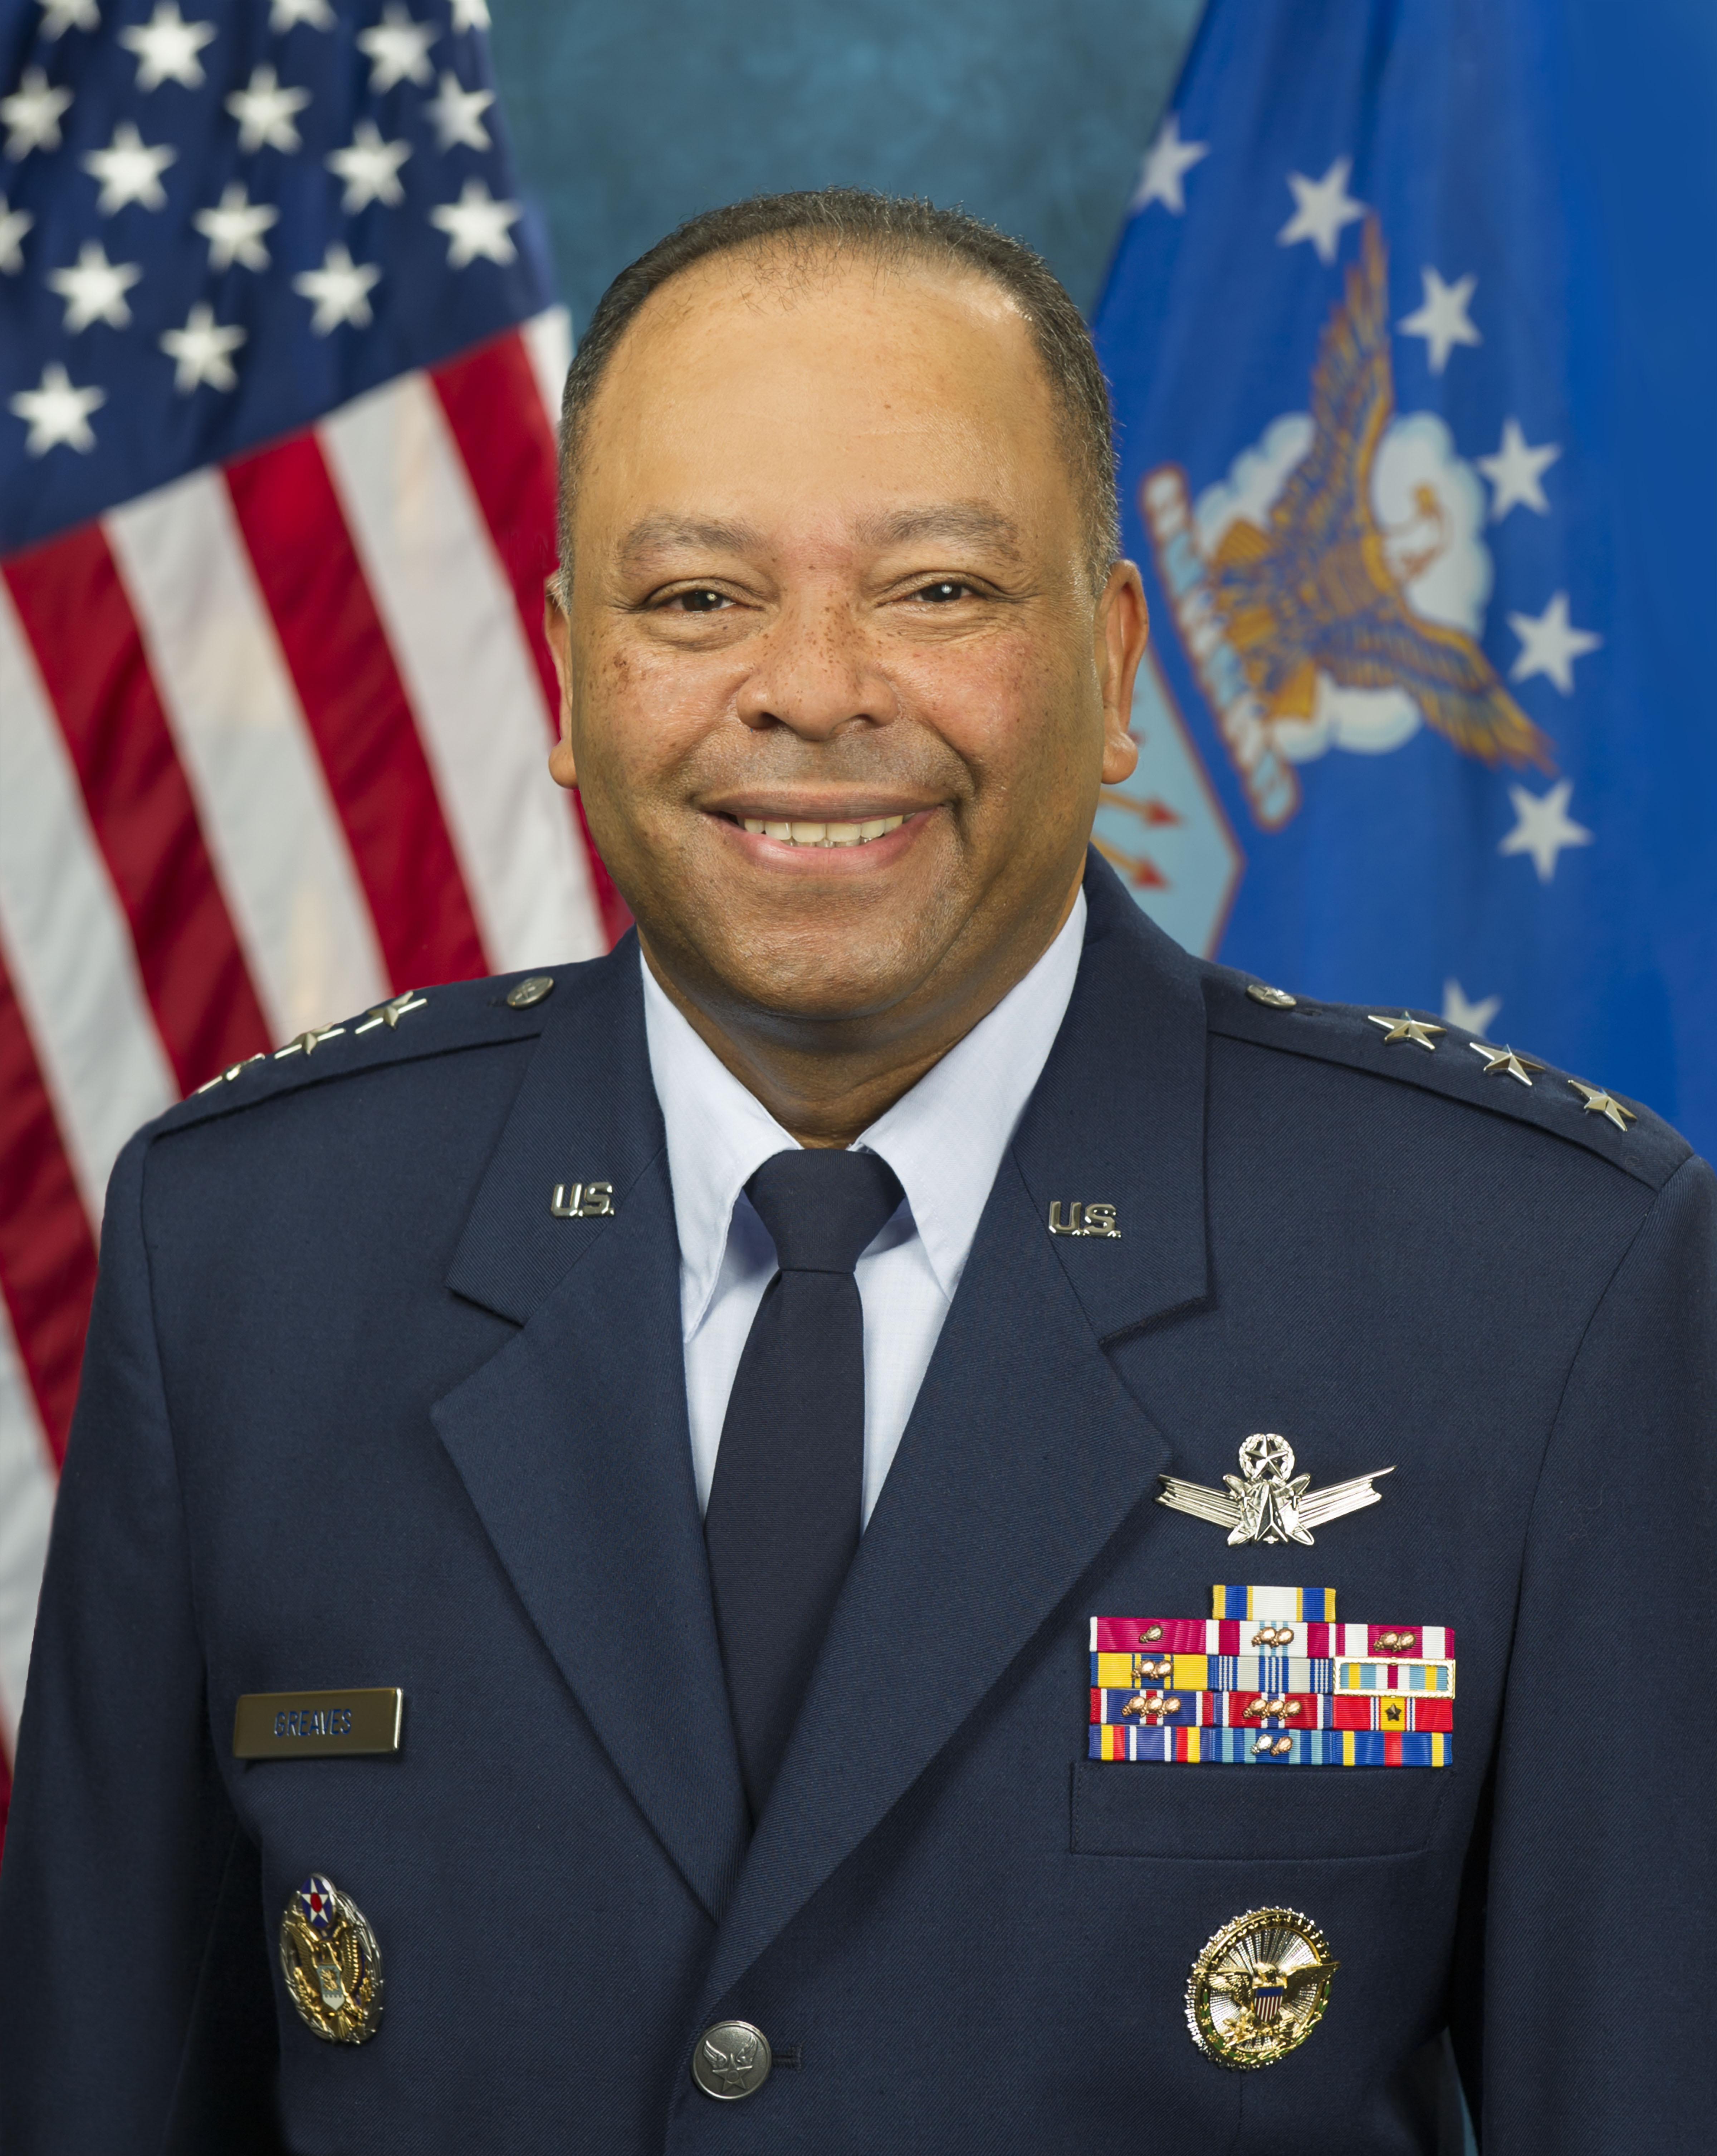 Lt. Gen. Samuel A. Greaves